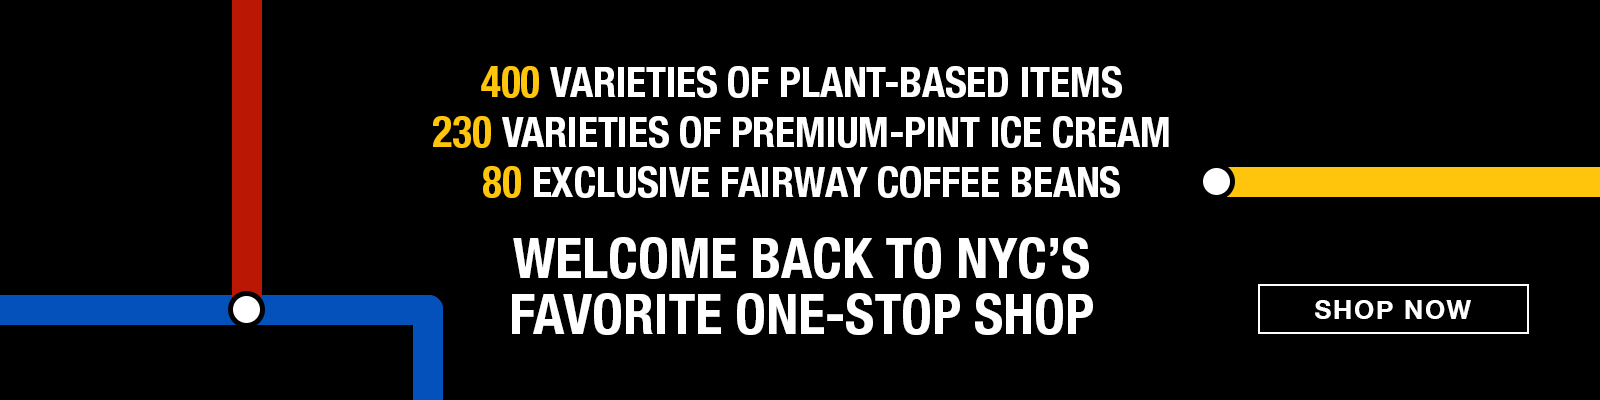 Welcome Back NYC